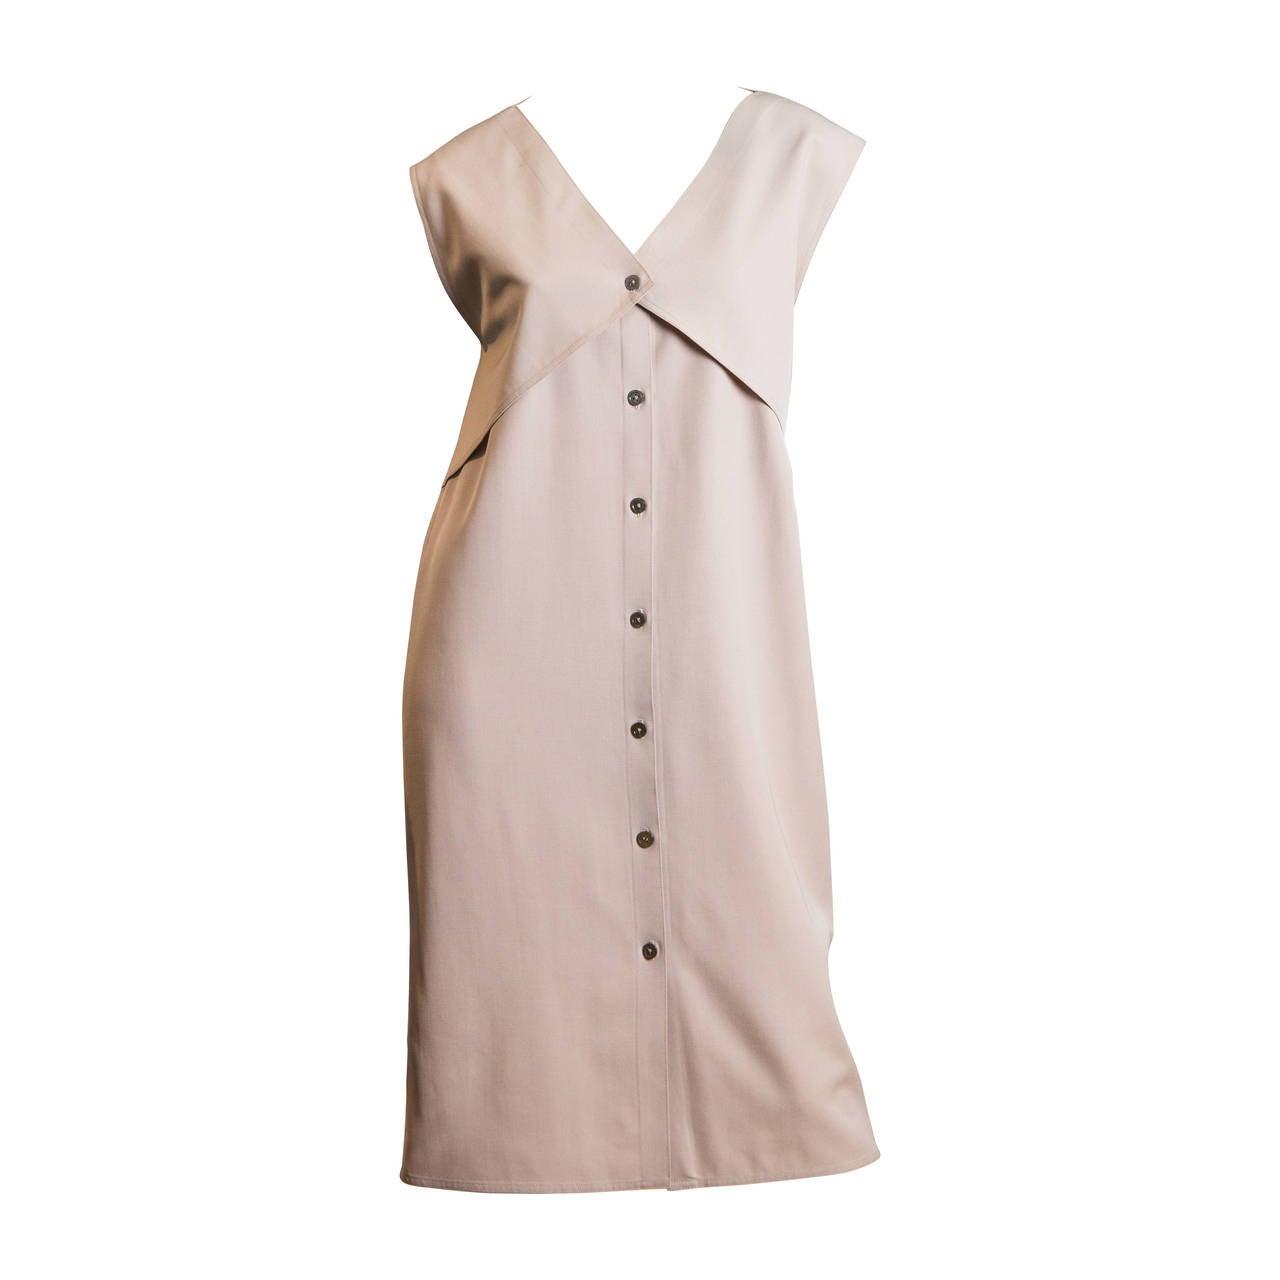 Minimalist Geoffrey Beene Dress 1